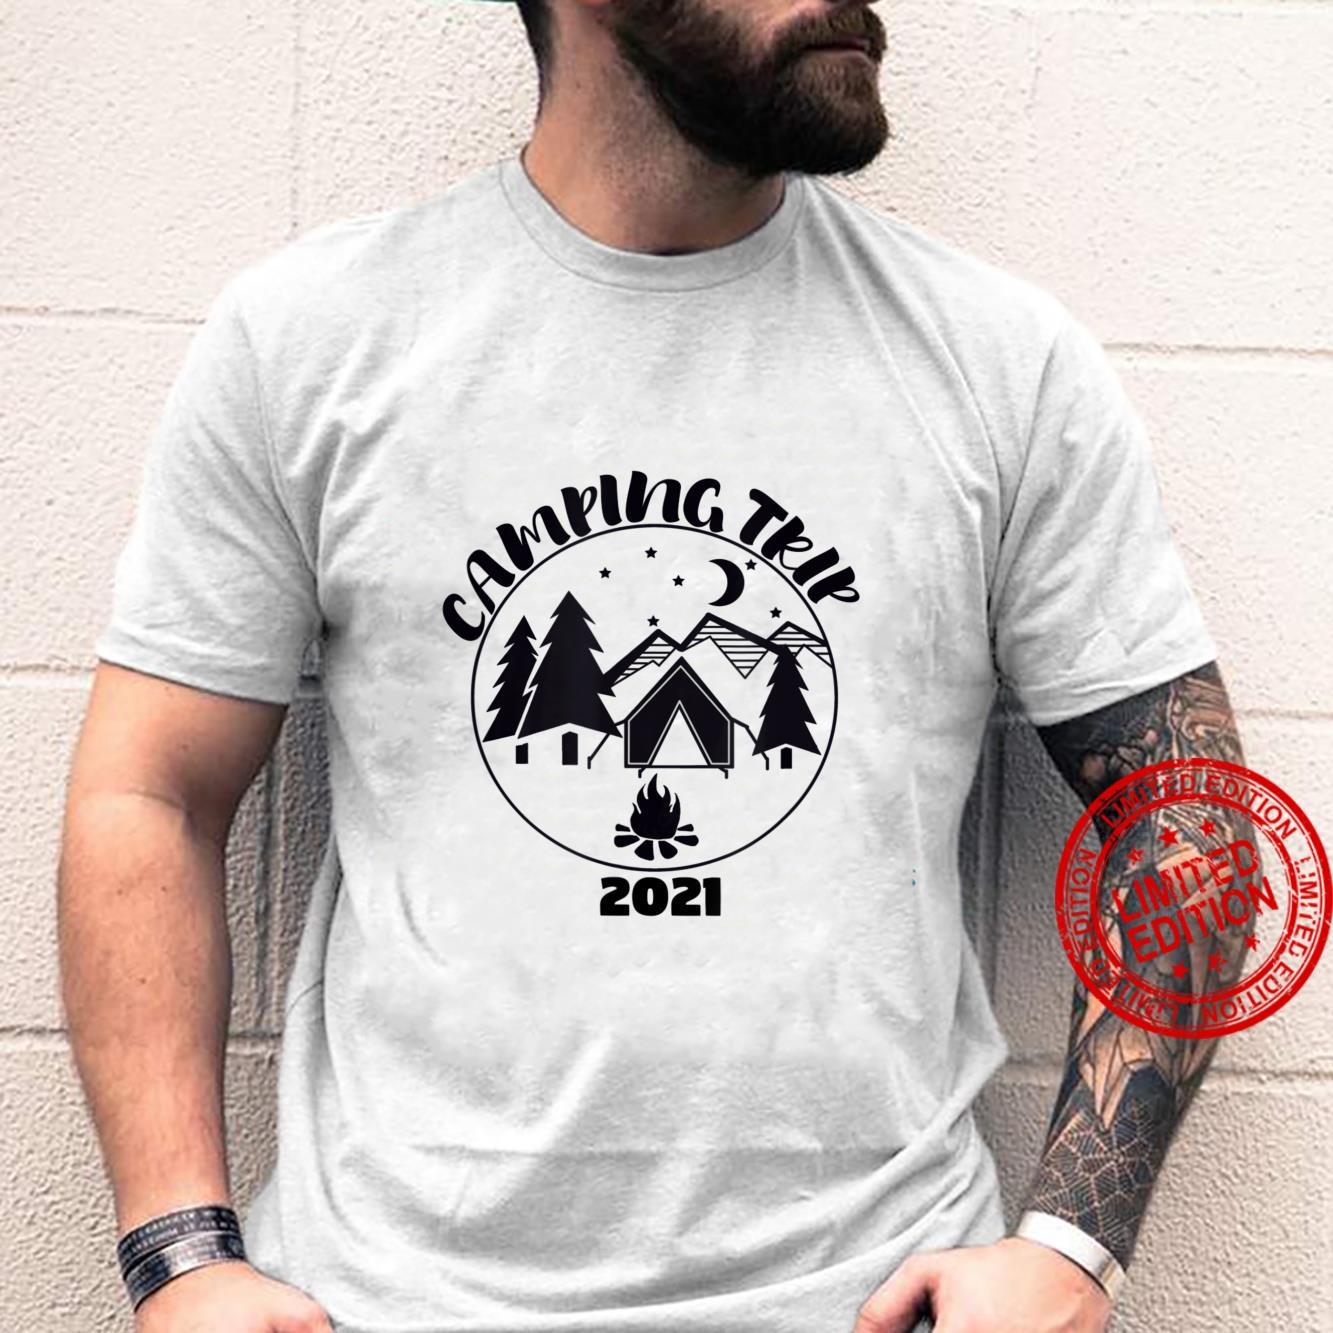 Camping Trip 2021 Shirt